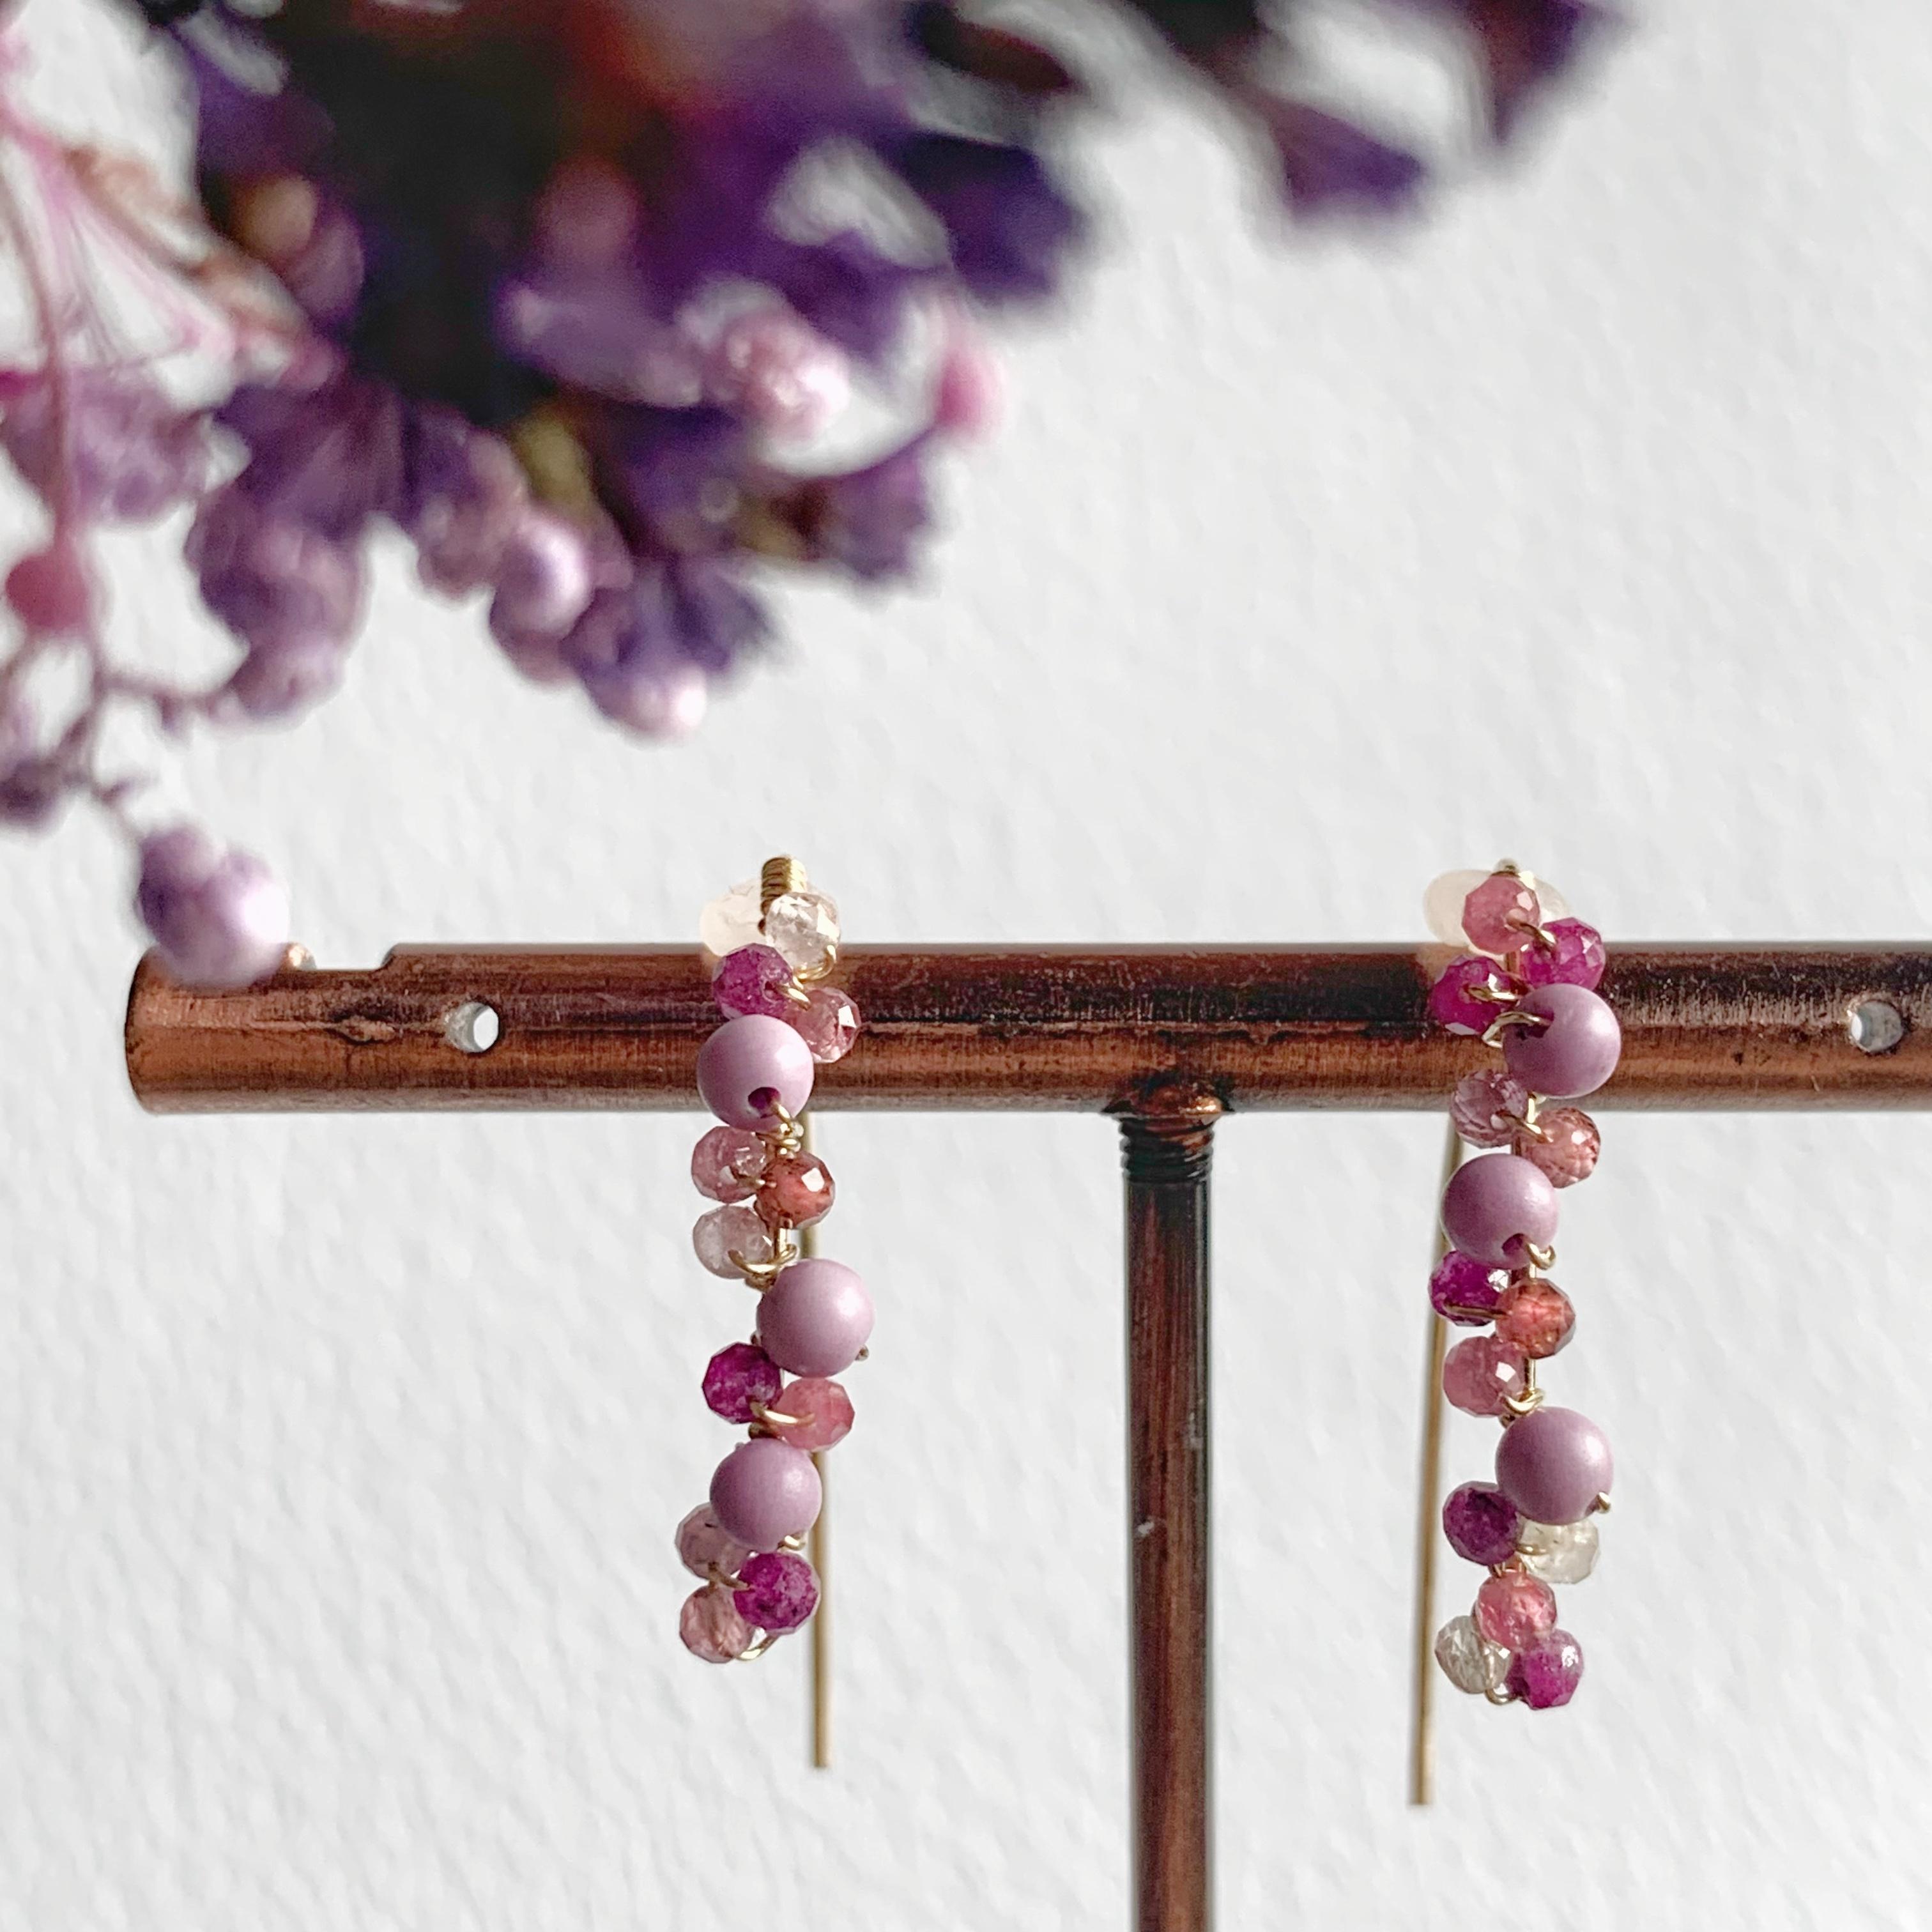 【JORIE】14kgf 葡萄の季節 マーキスピアス(ルビー、ピンクトルマリン、フォスフォシィデライト)